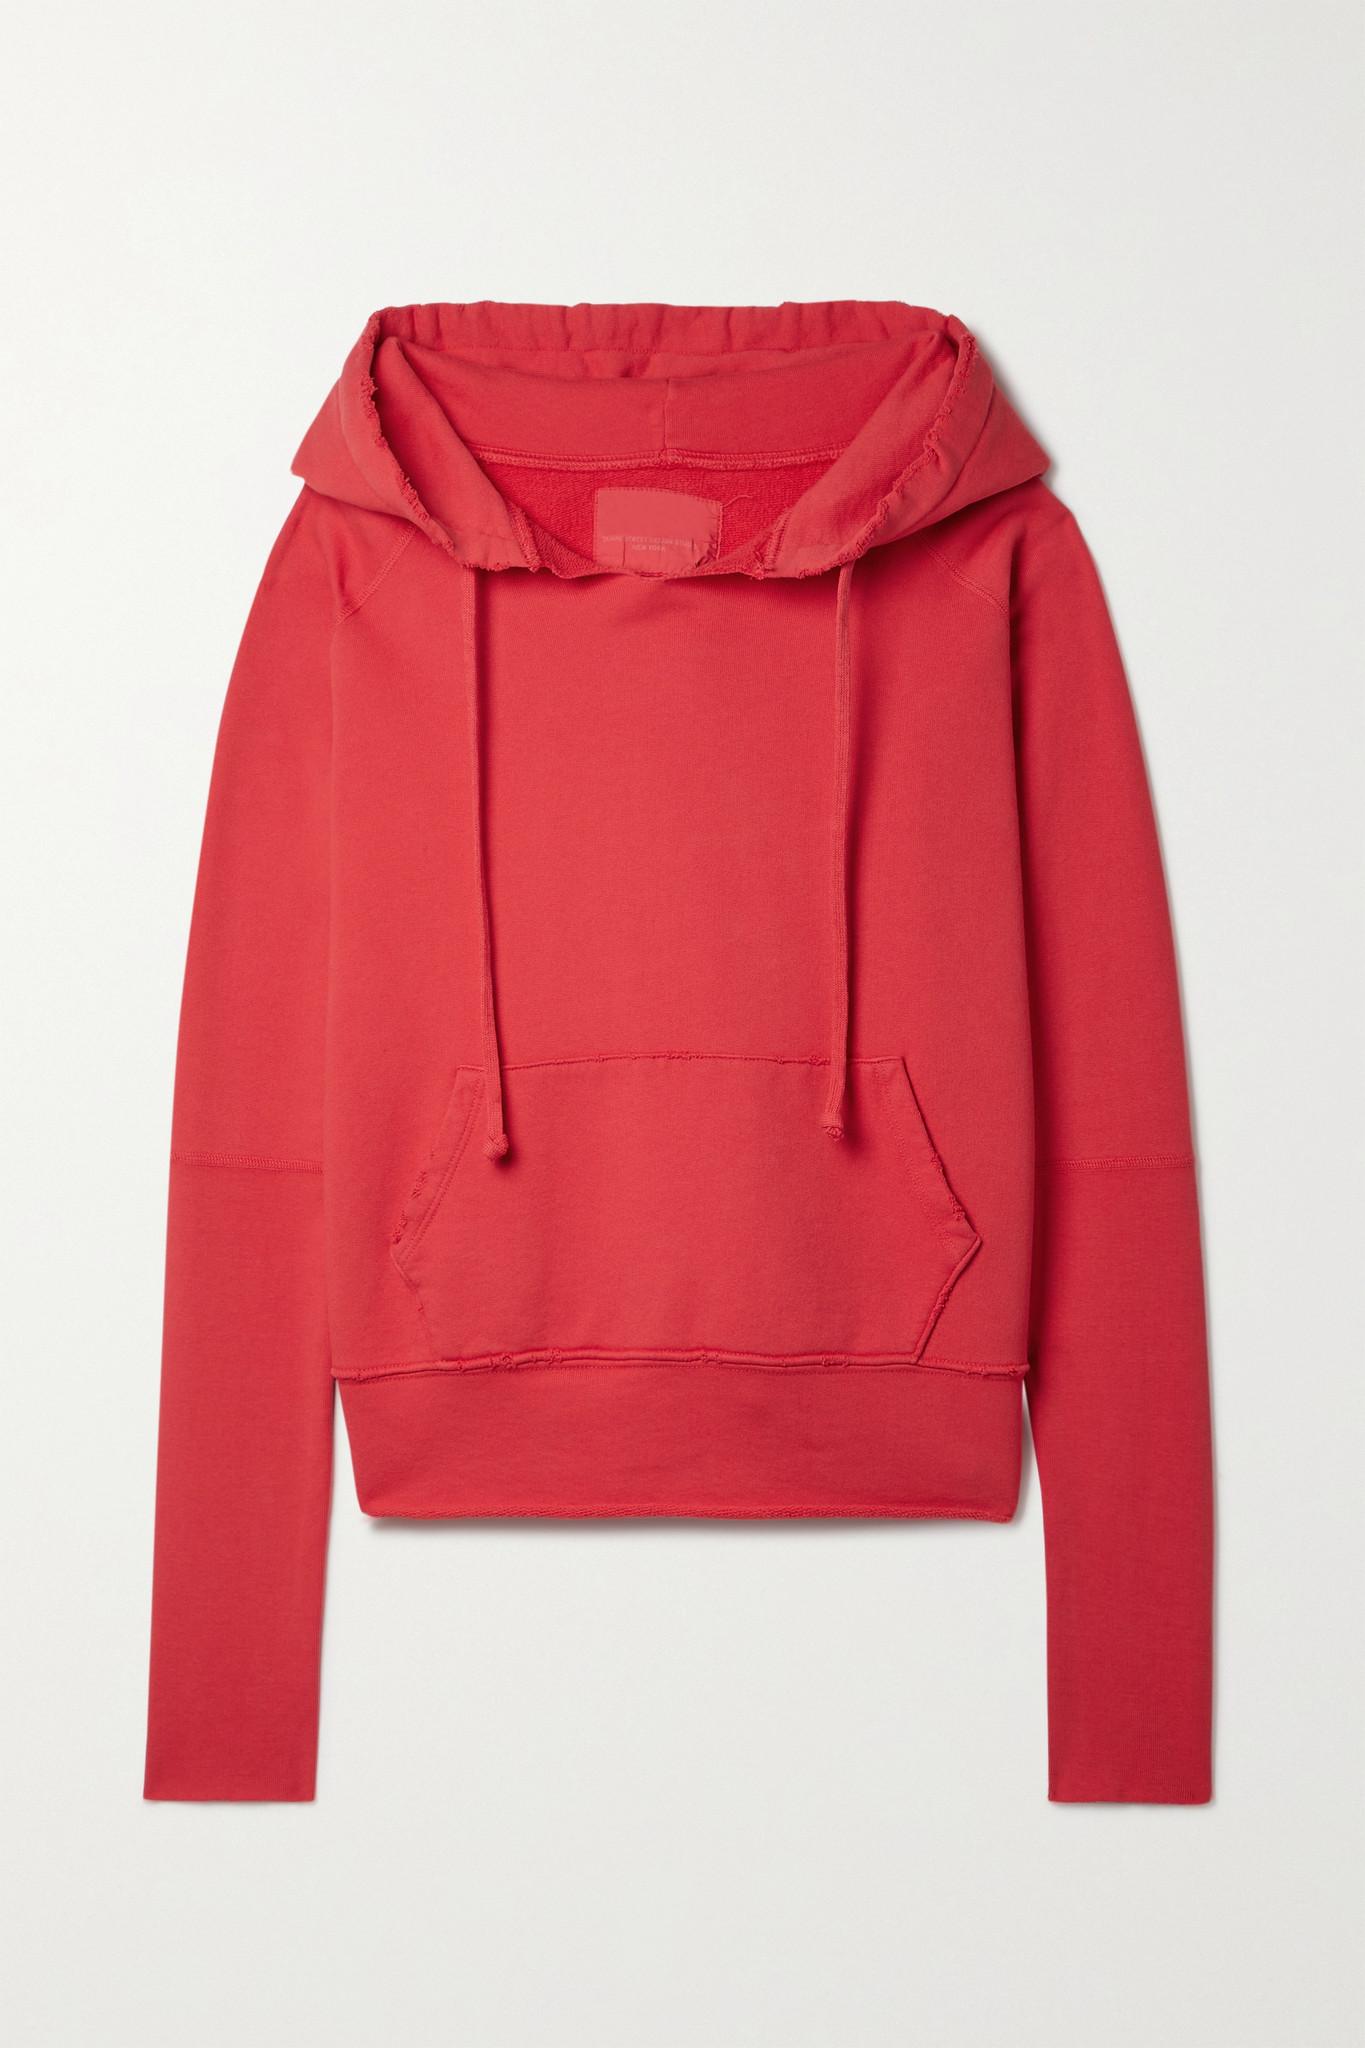 NILI LOTAN - Janie Distressed Cotton-jersey Hoodie - Red - x small